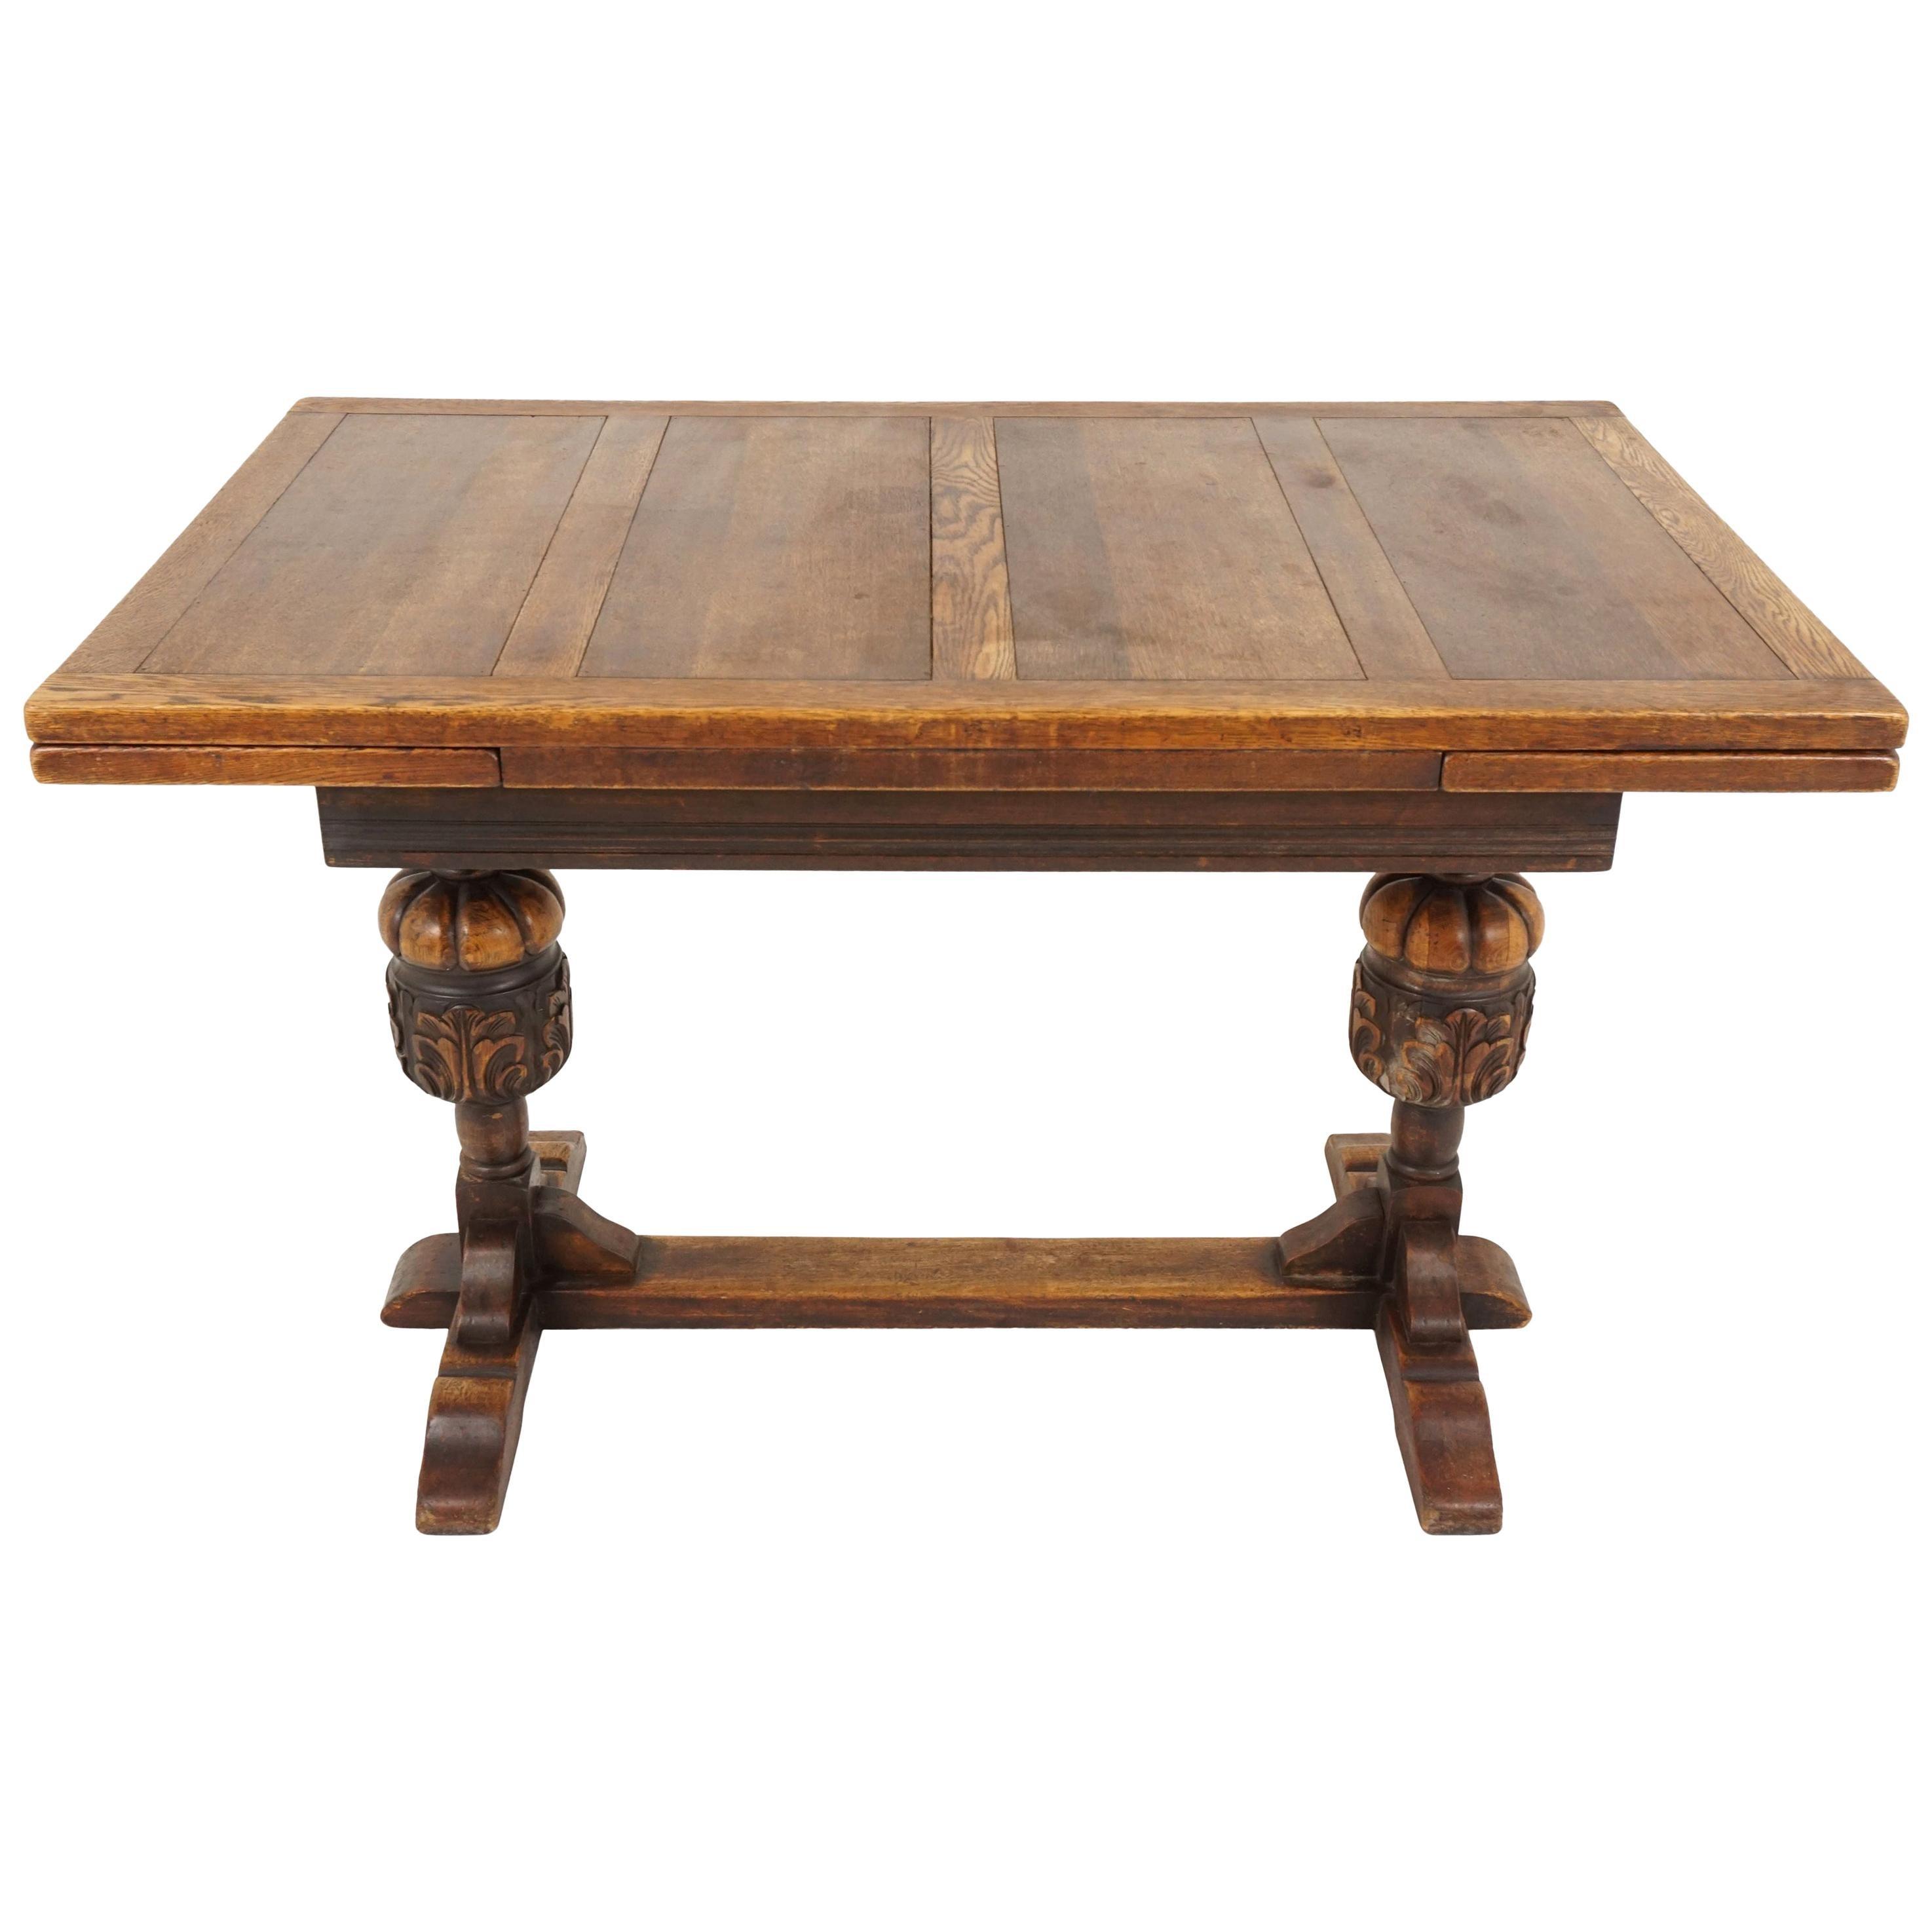 Vintage Oak Refectory Table, Draw Leaf, Writing Table, Scotland 1930, B2124